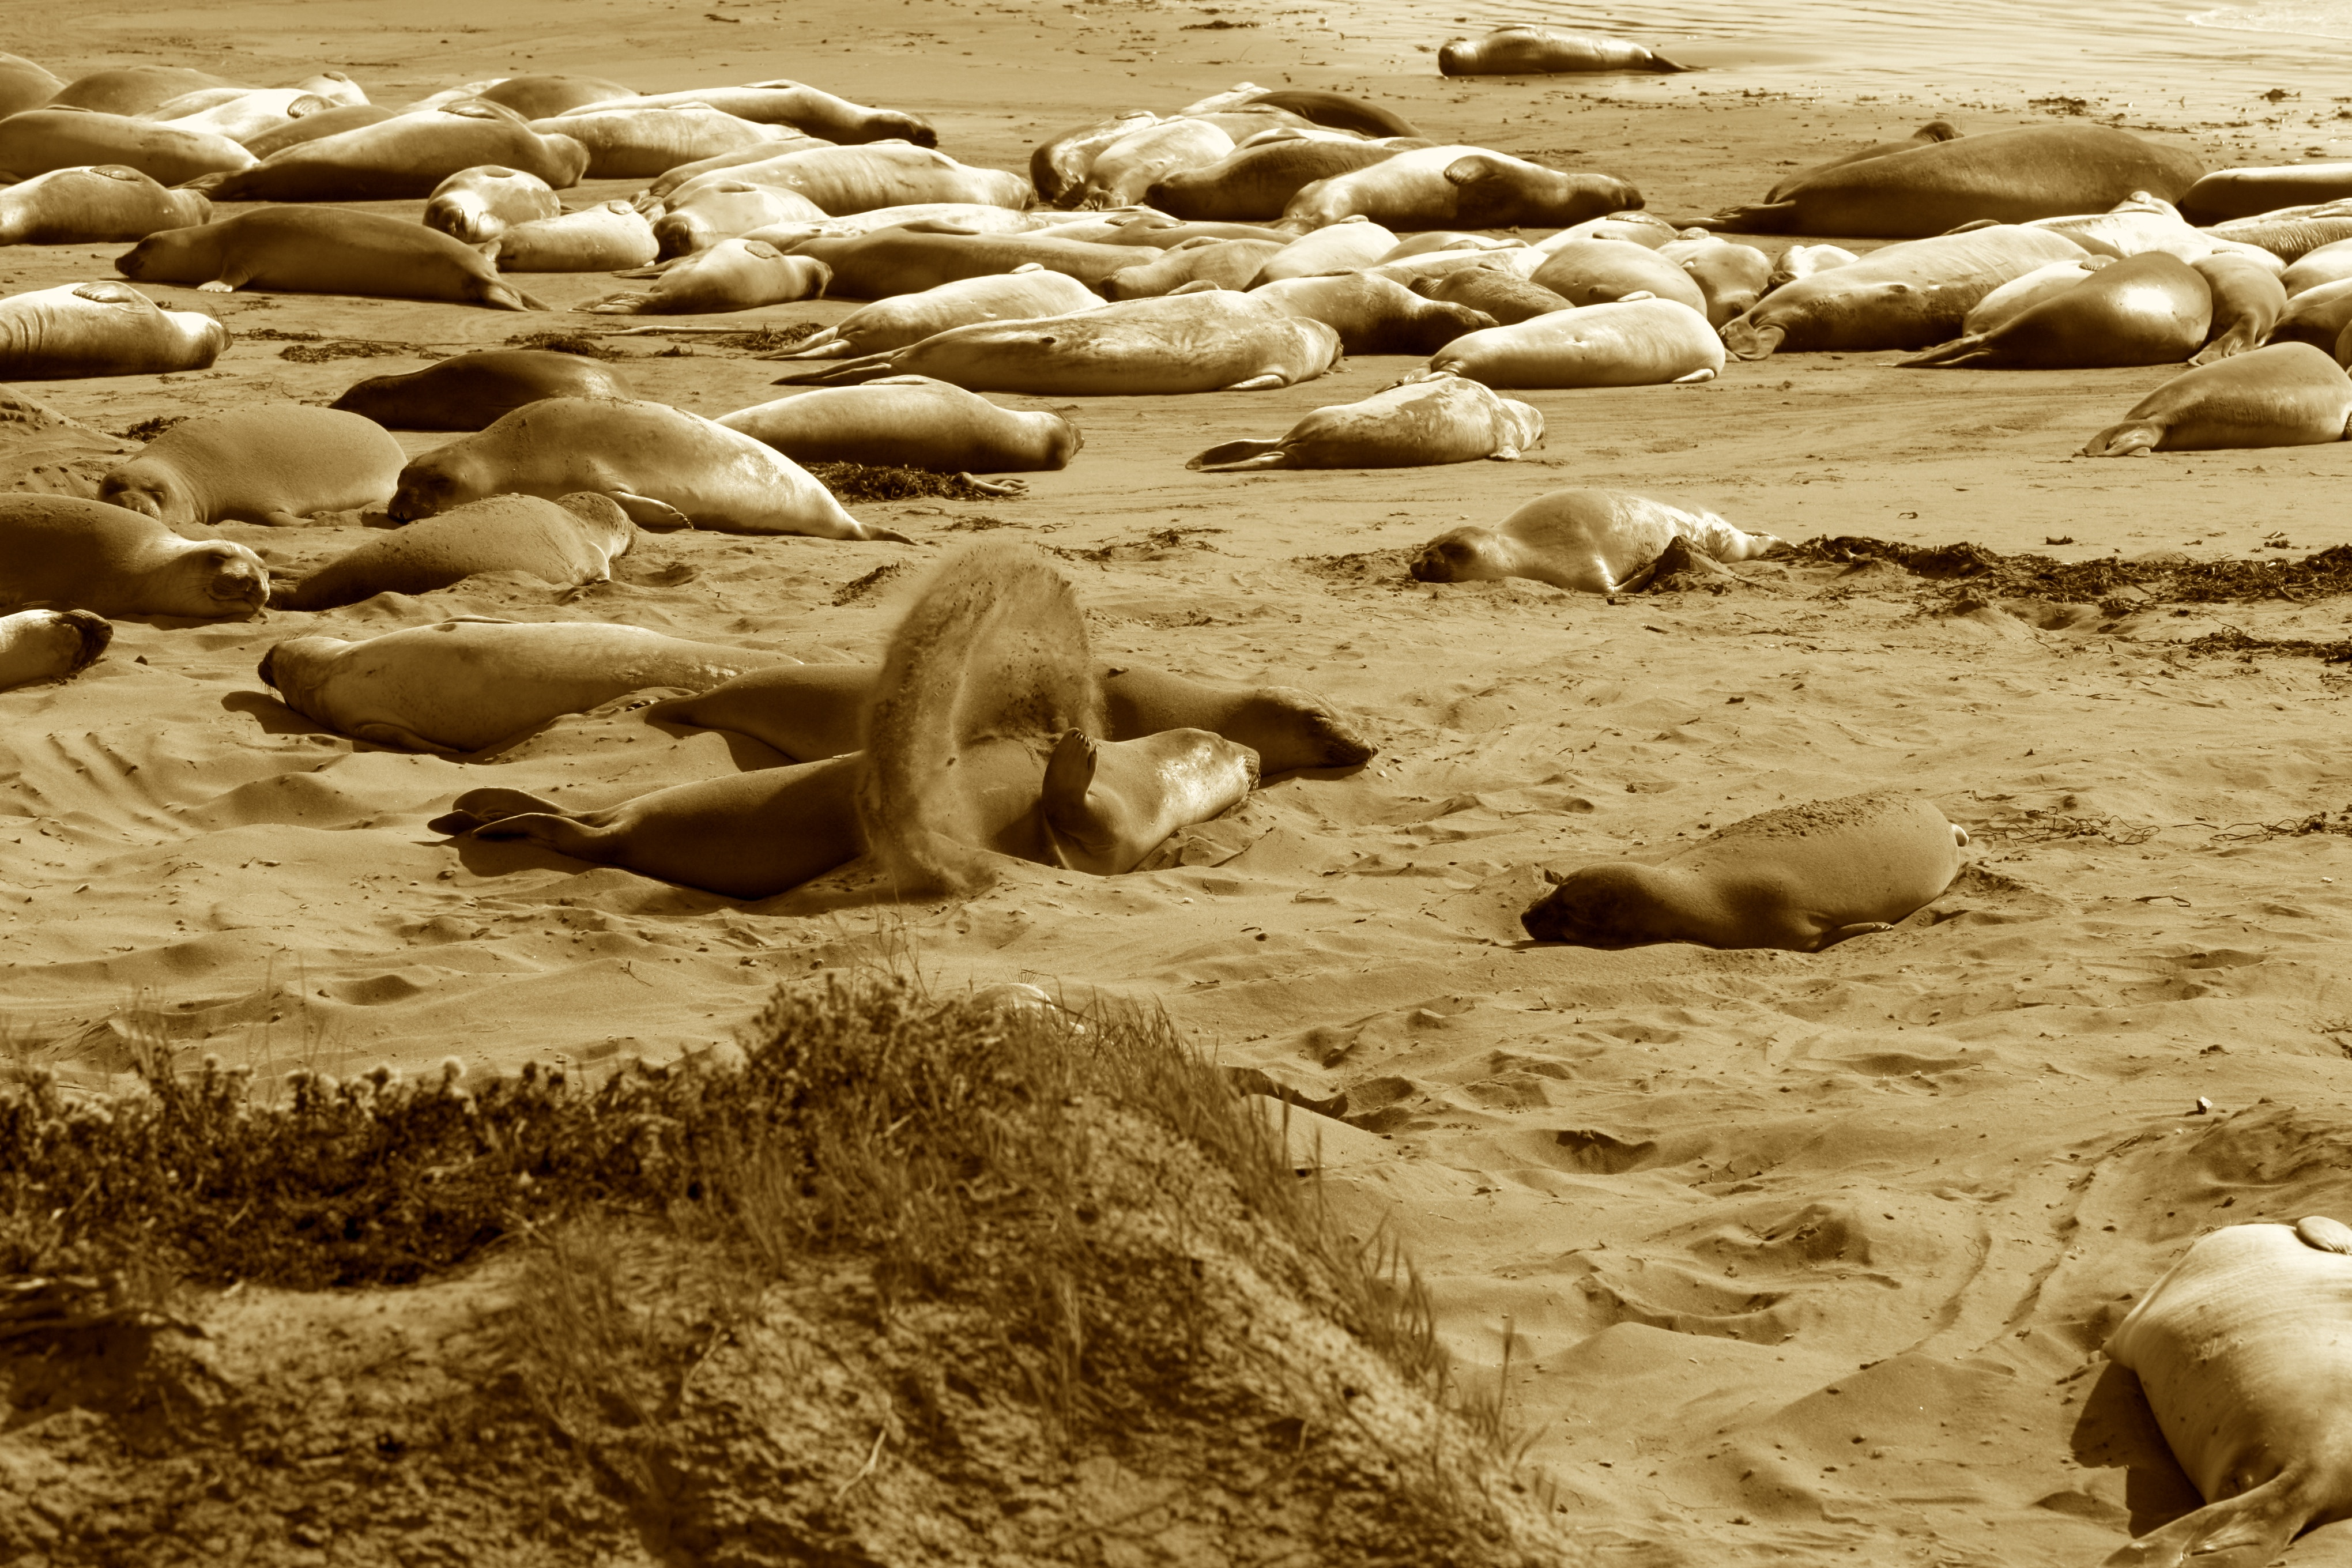 Piedras+Blancas+Elephant+Seal+sand+circle